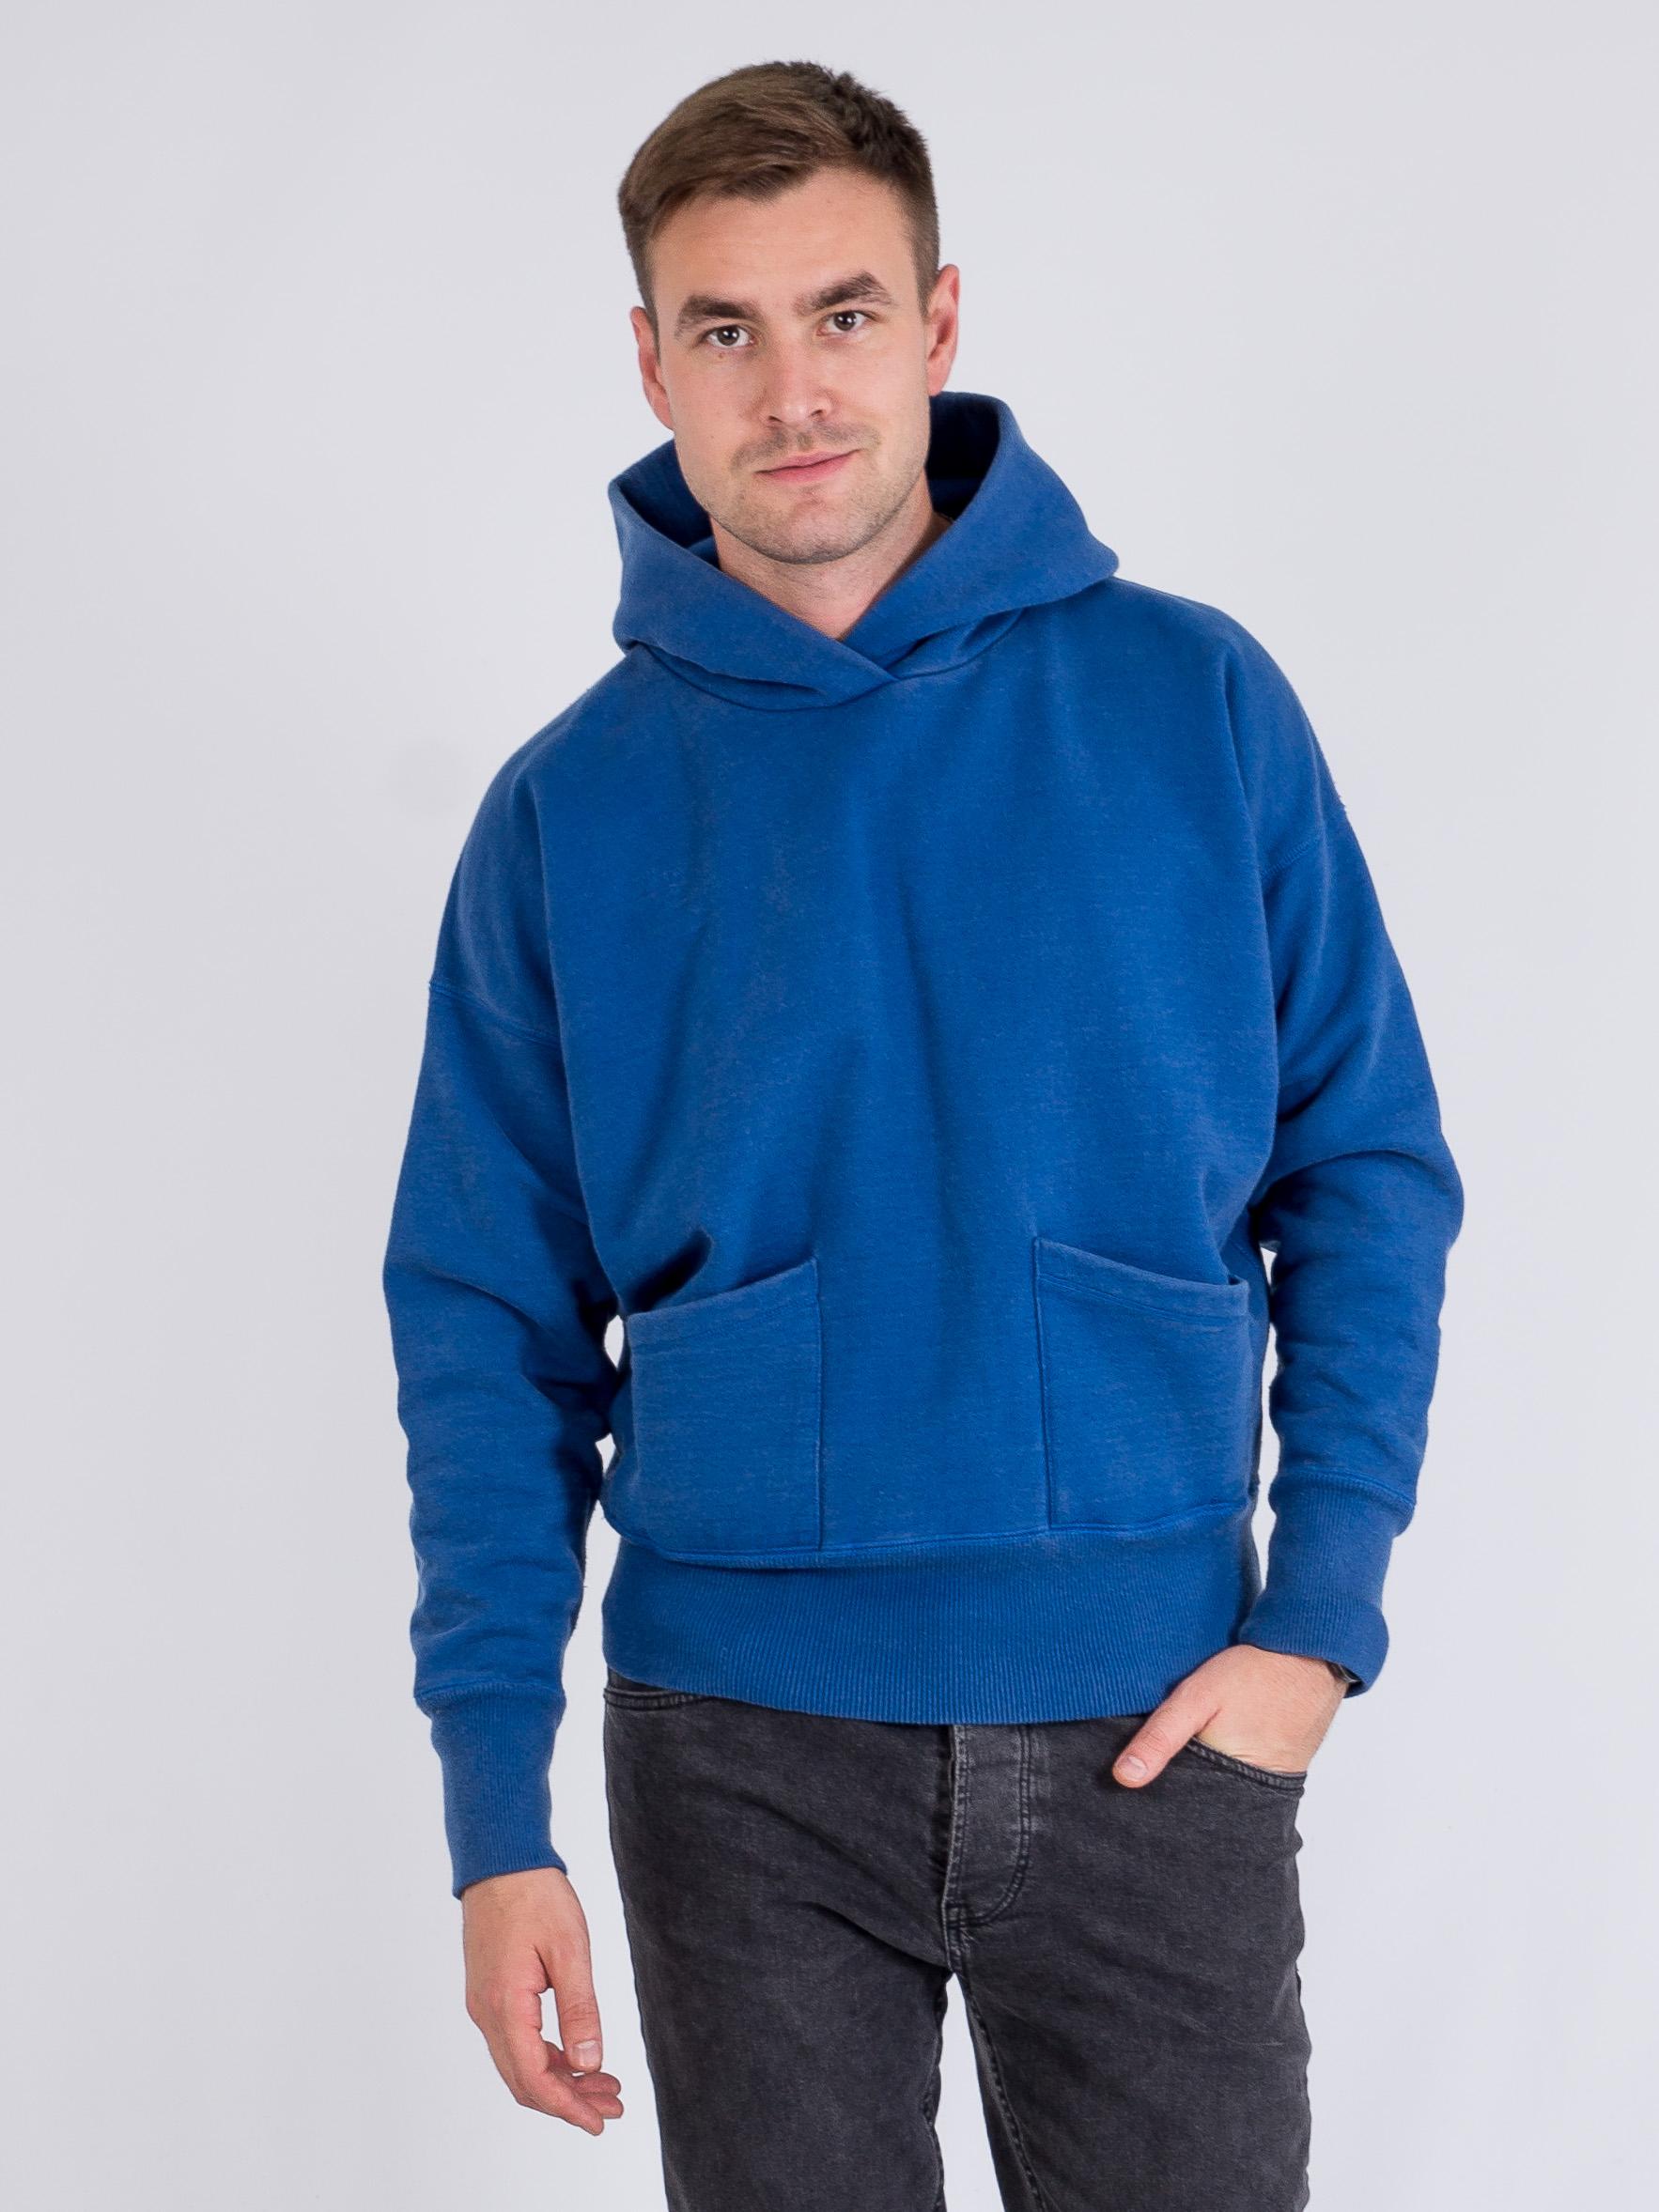 Худи с 2 карманами Синий Free Style